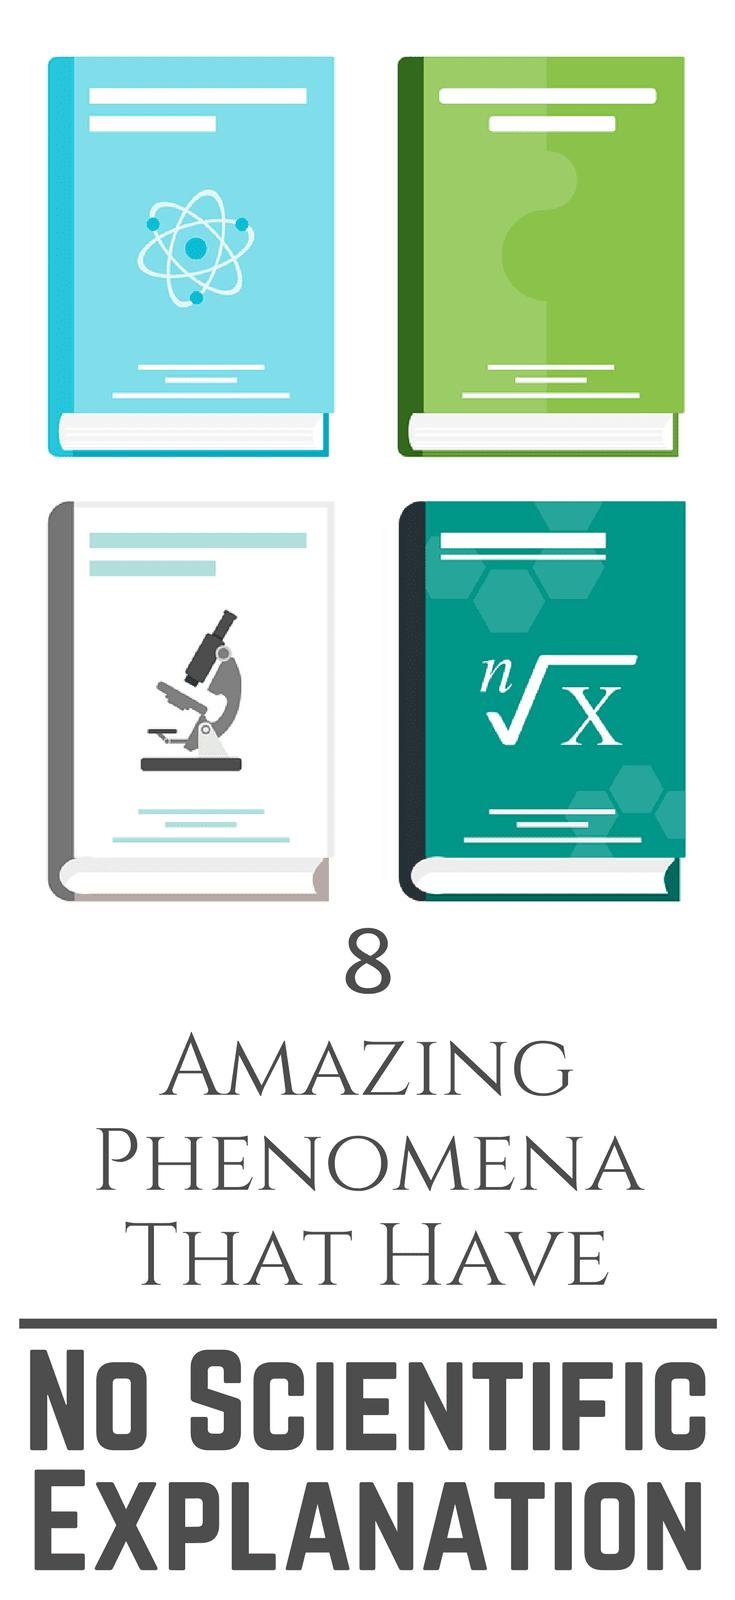 8 Amazing Phenomena That Have No Scientific Explanation